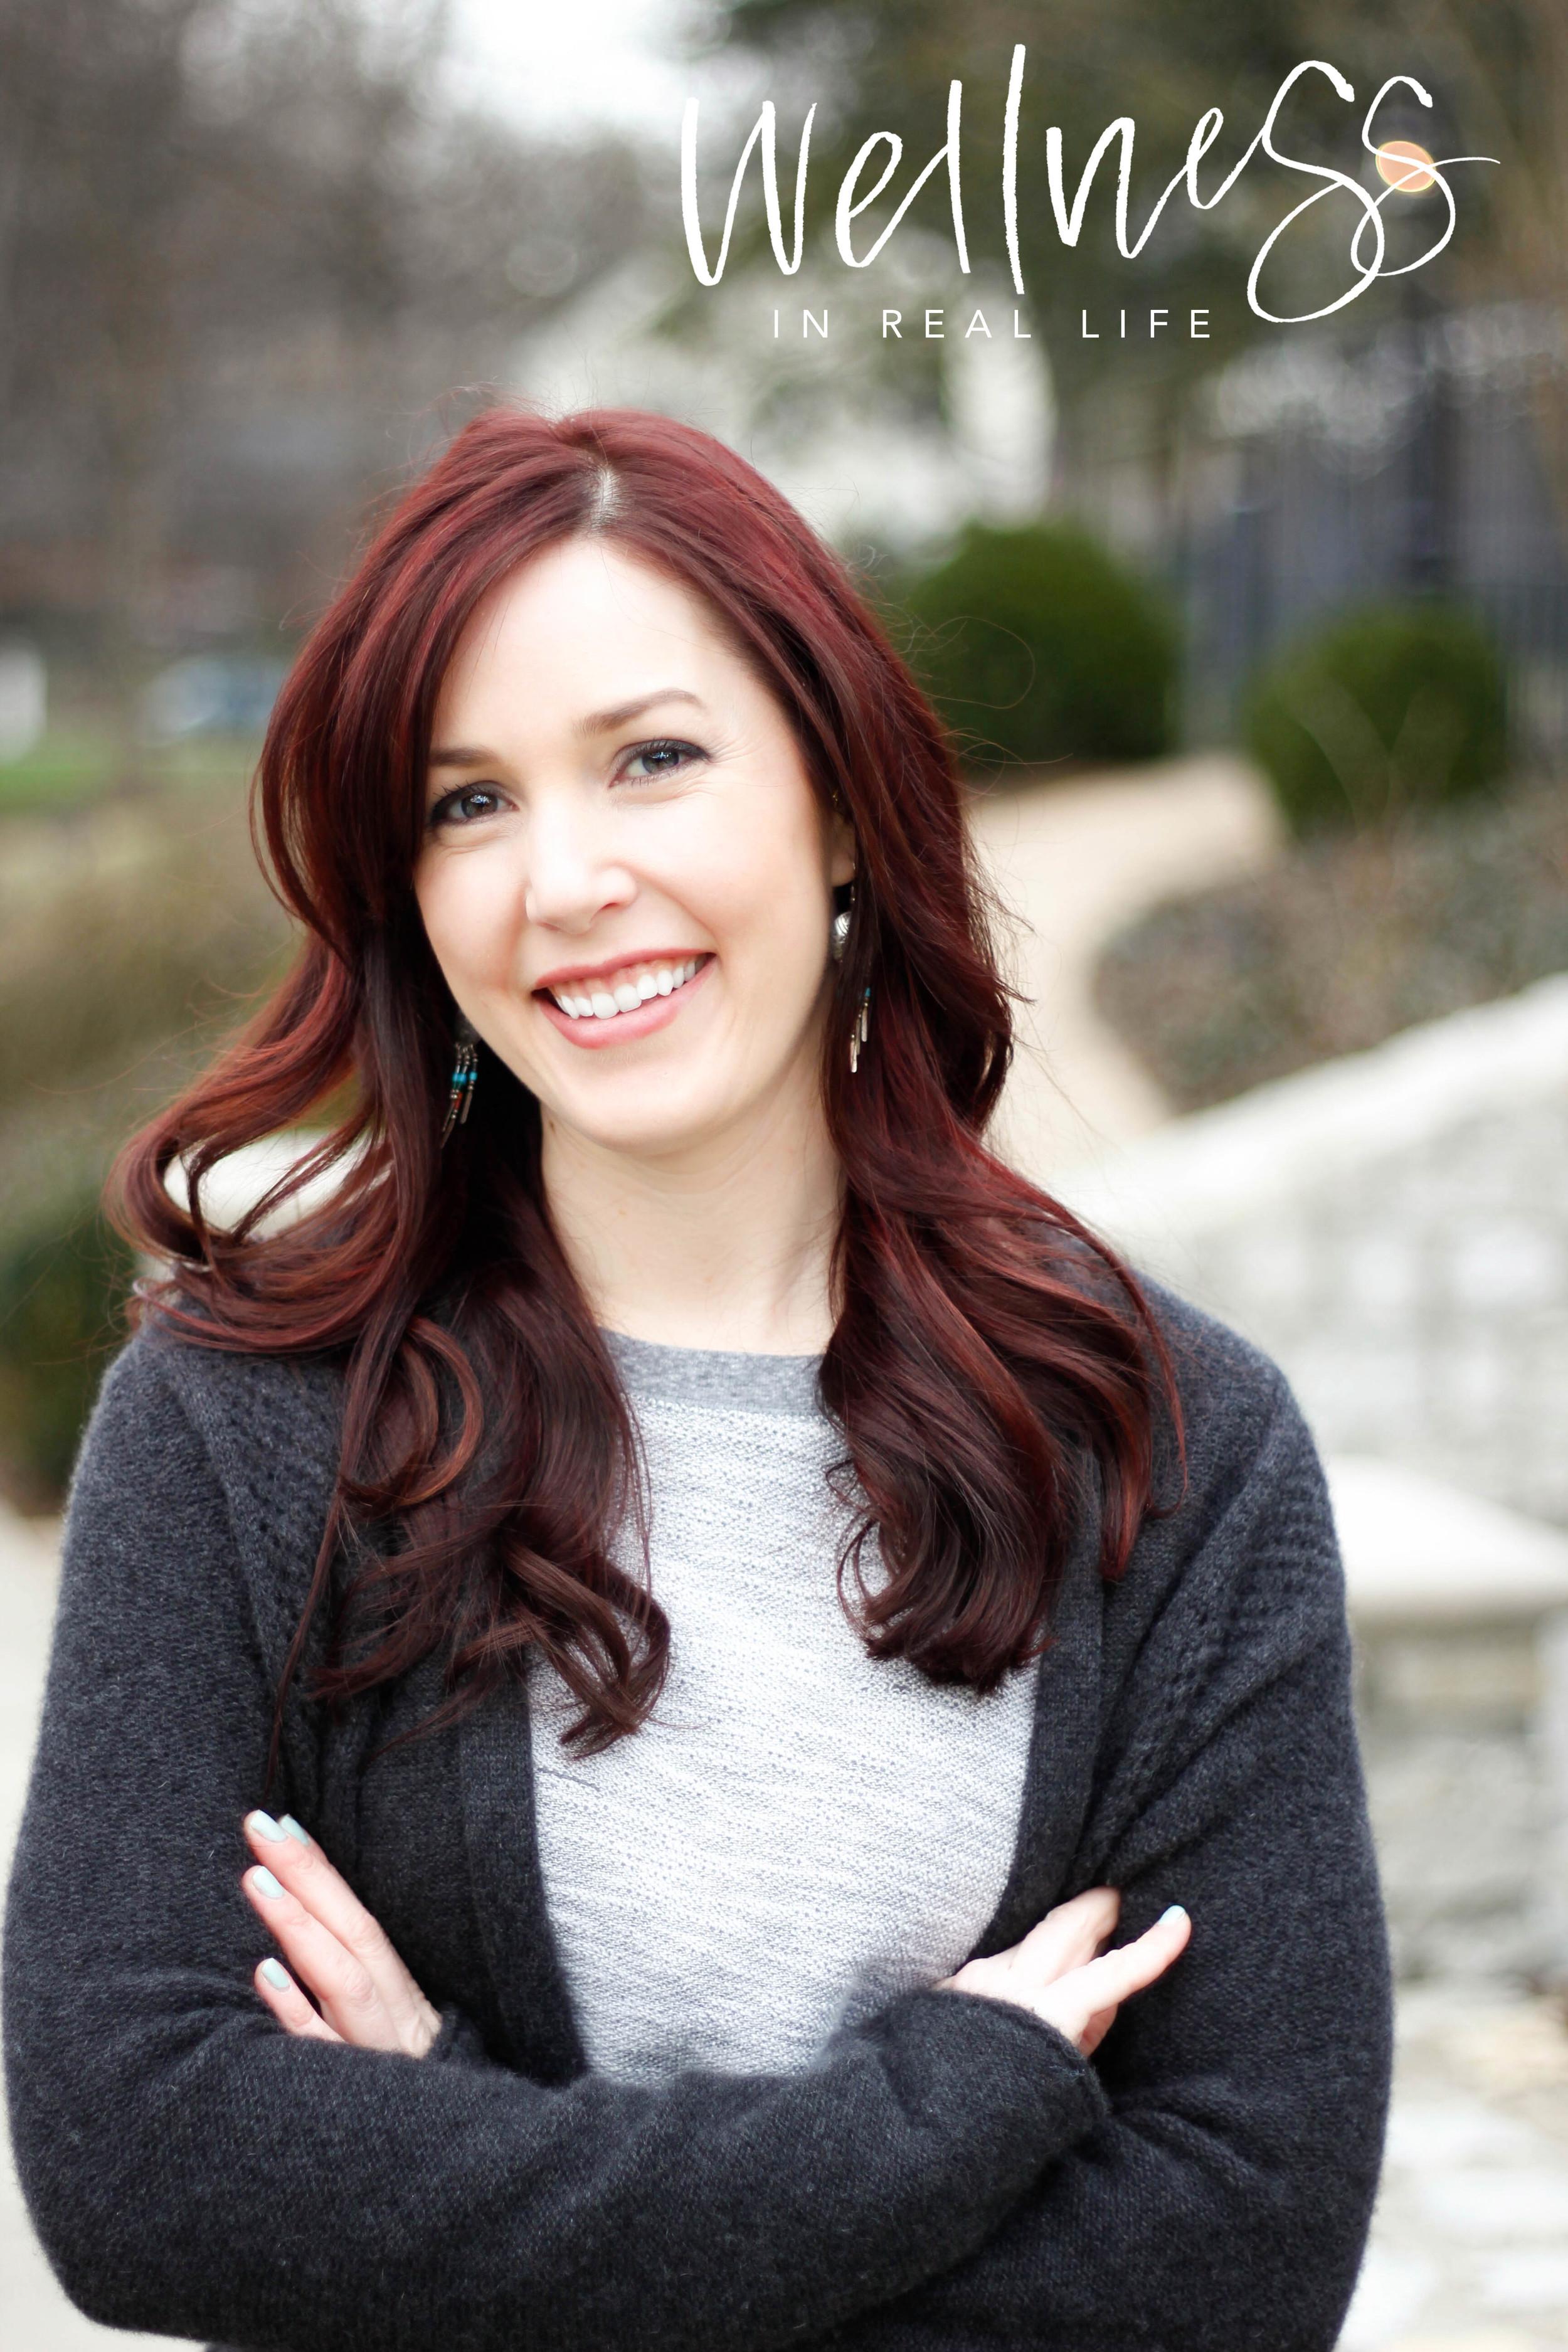 Wellness IRL: Rachel | Jennifer Diaz | Hand Lettering by Amy May Paper